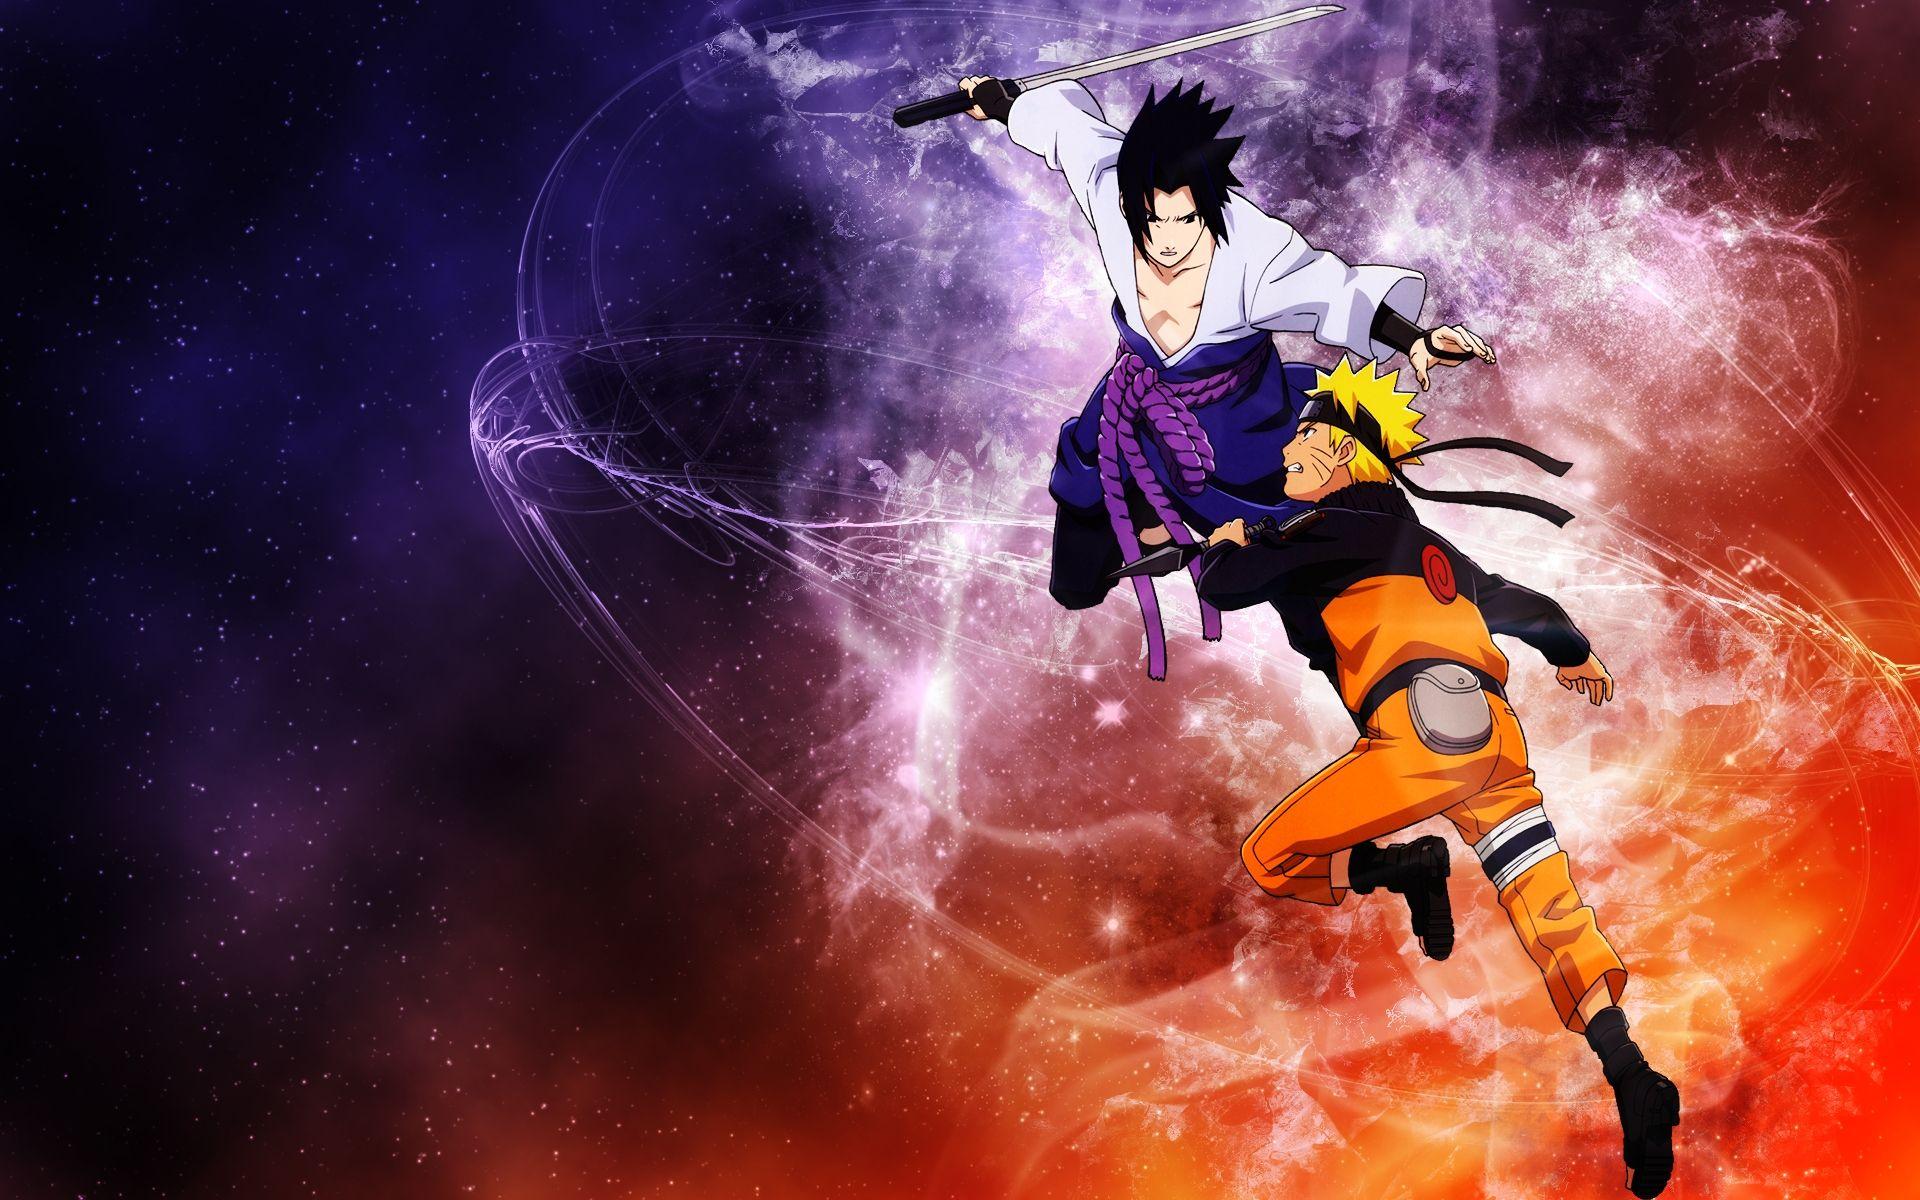 Naruto and Sasuke, Wallpaper Picture